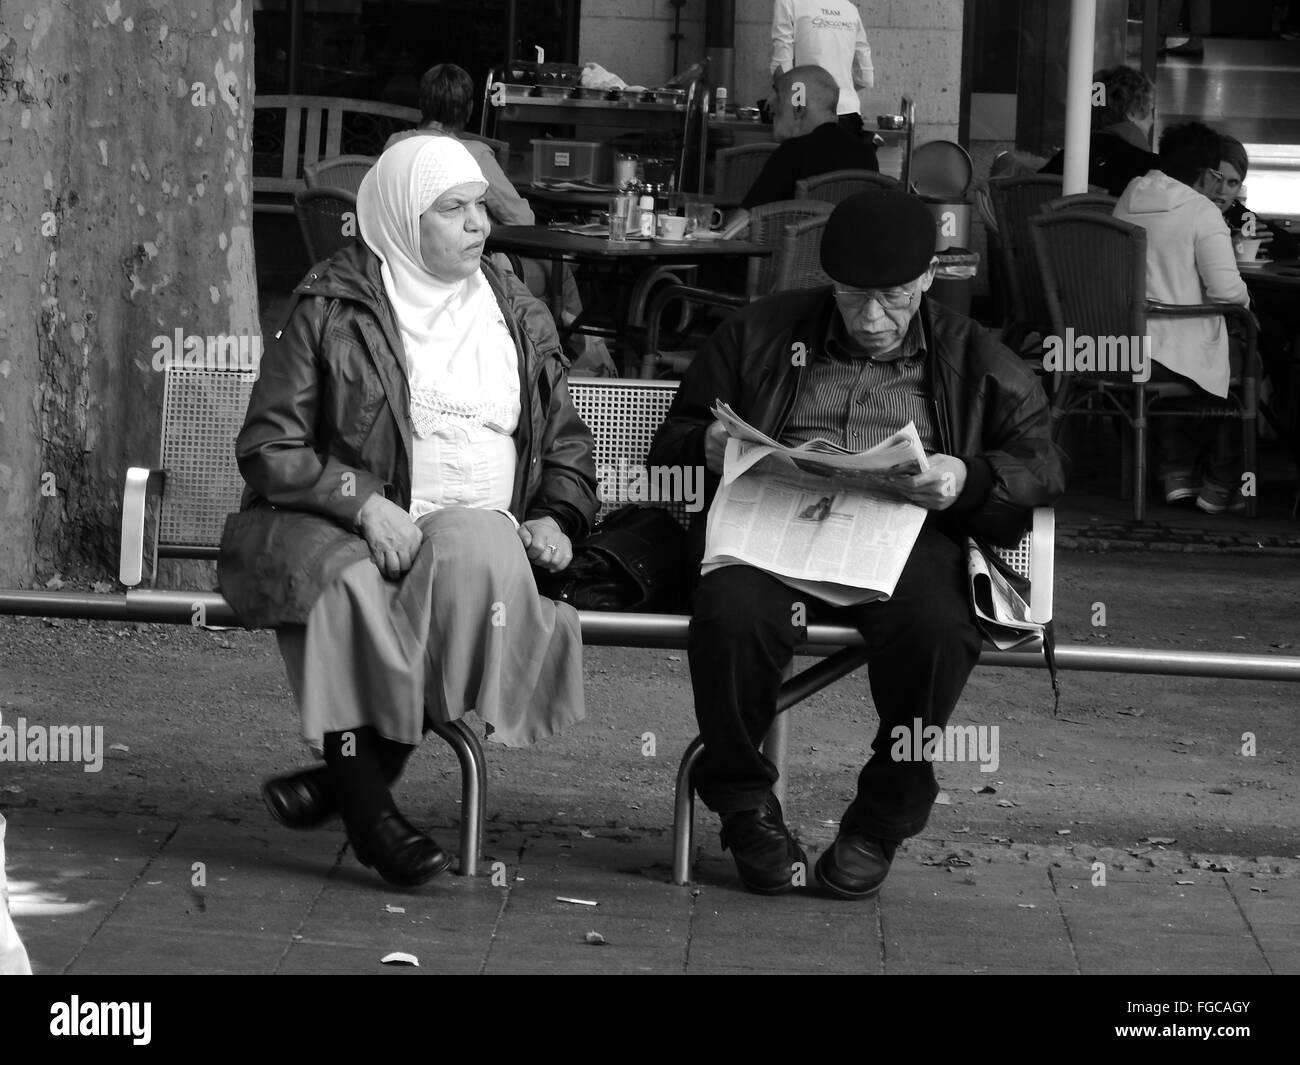 people sitting on a bench, man reading newspaper, Bonn, Bottlerplatz, Germany - Stock Image